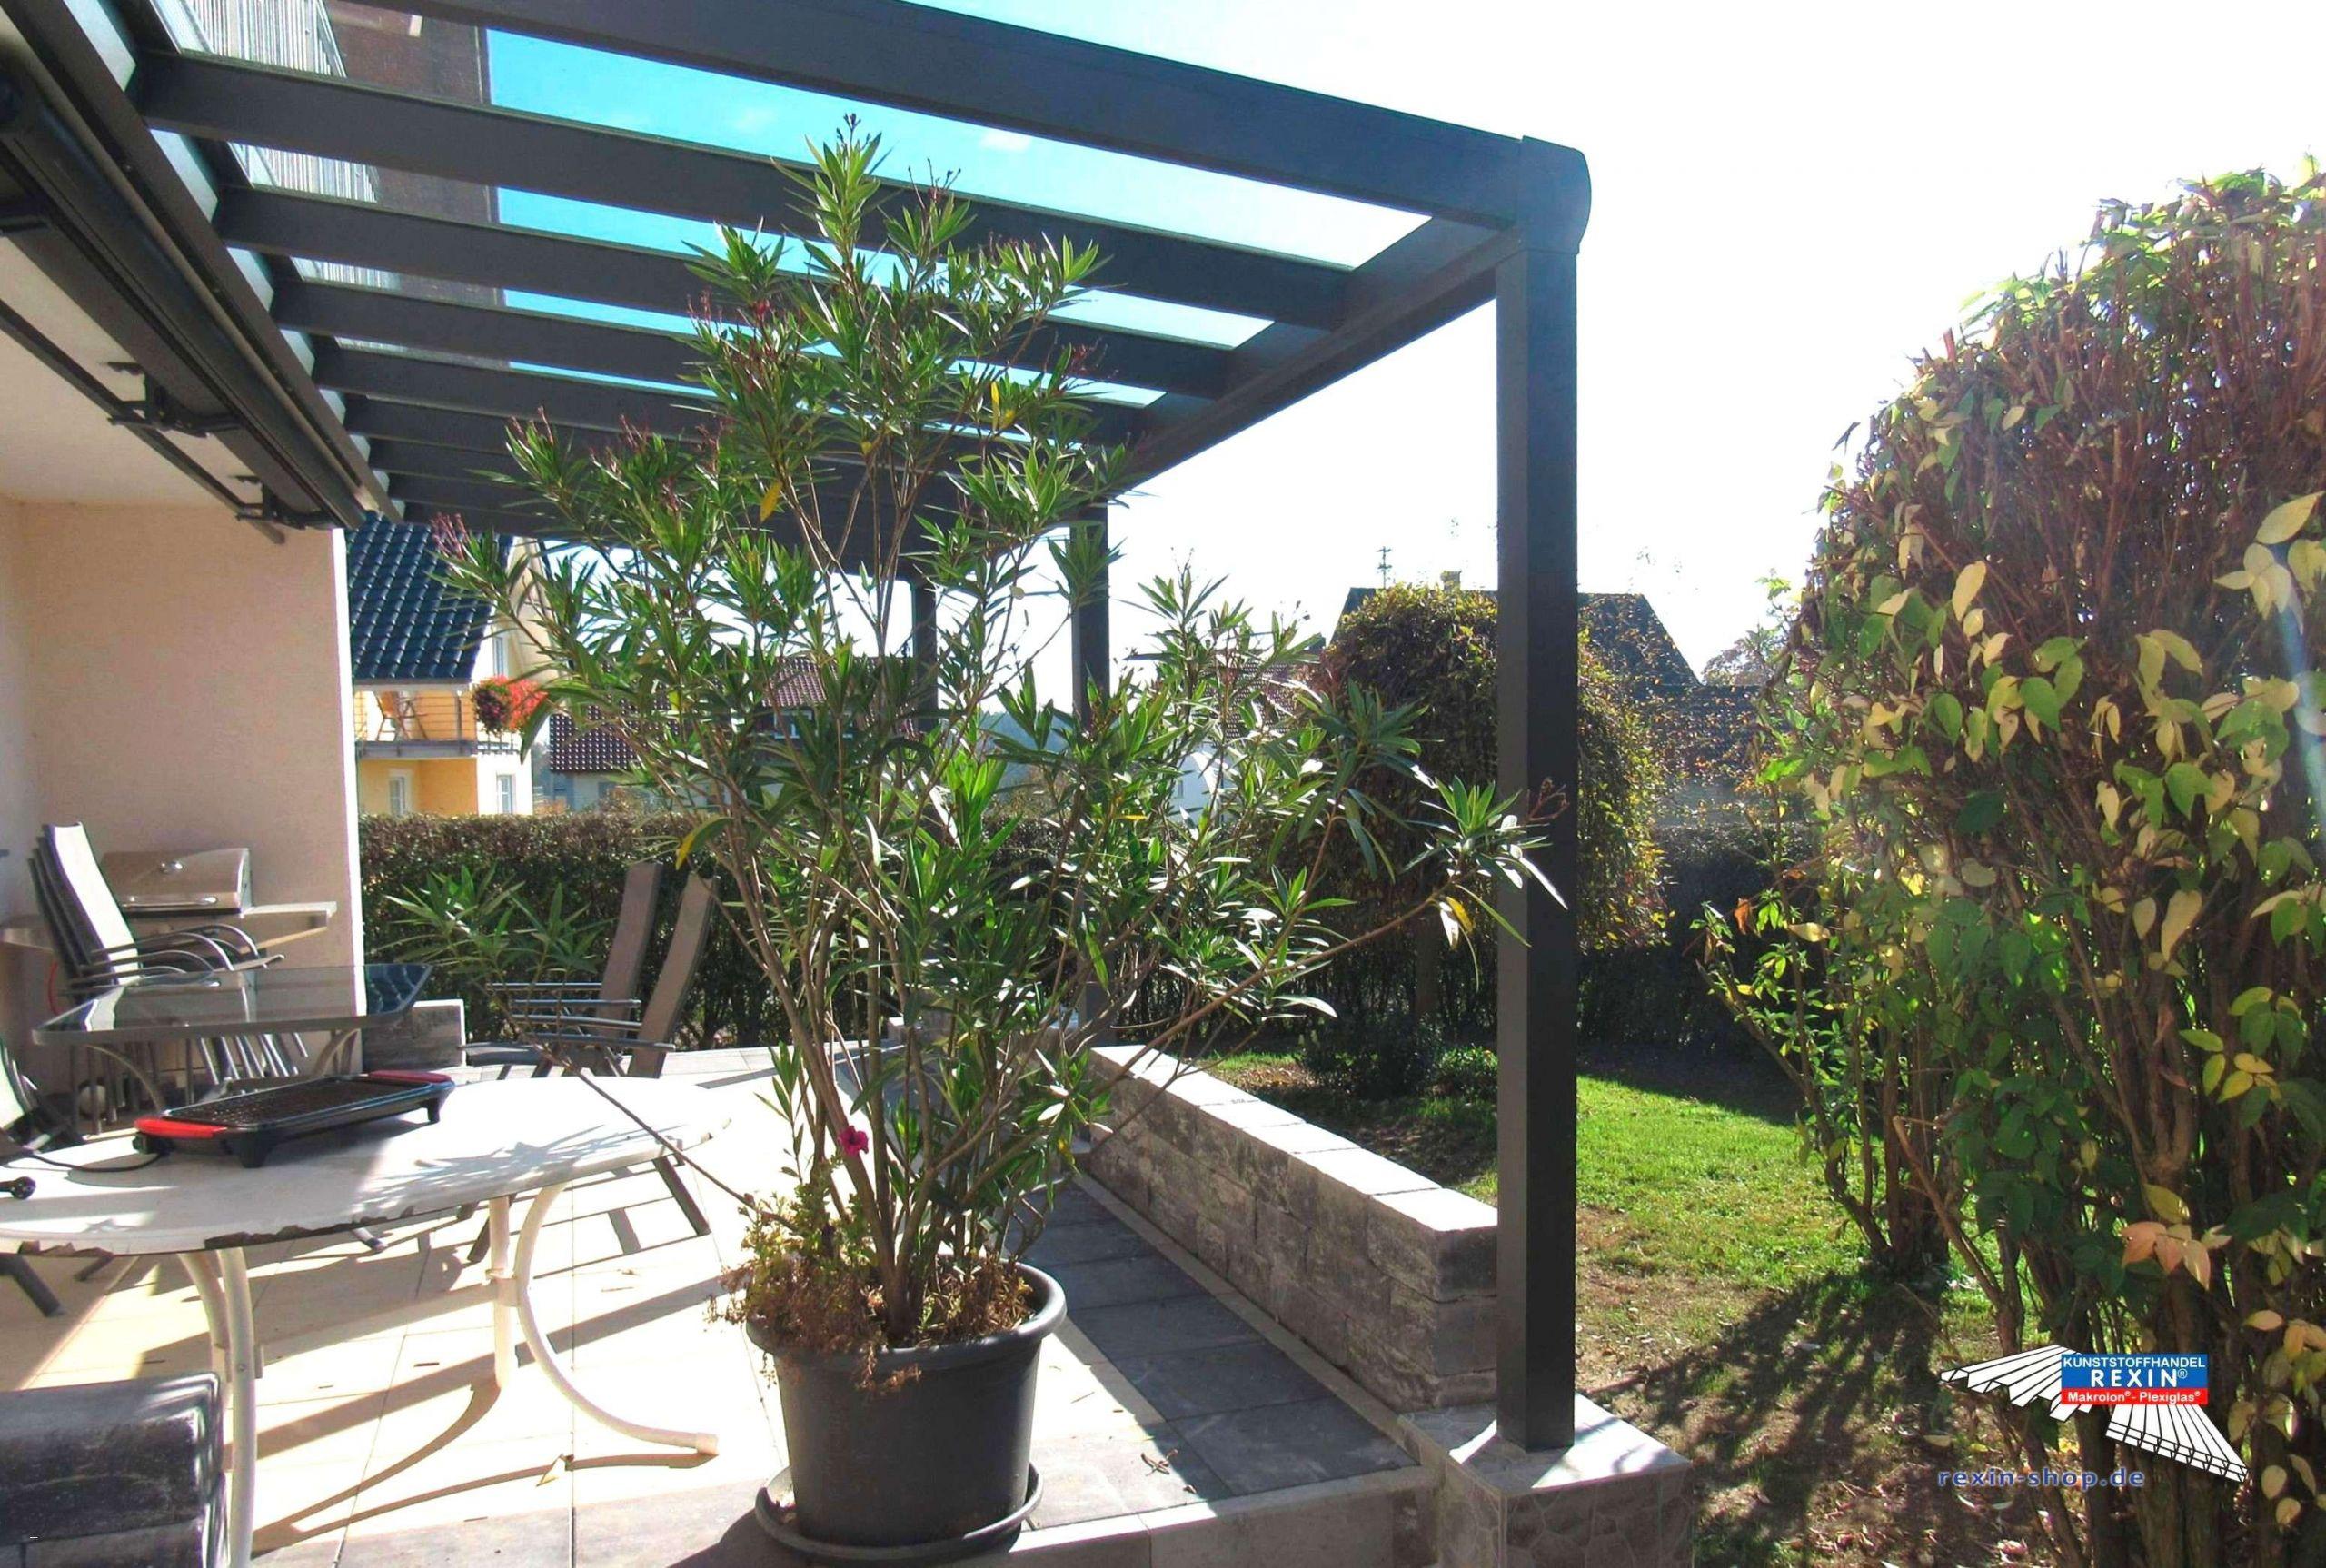 garten beispiele terassen ideen genial balkon ideen luxus wintergarten balkon 0d of garten beispiele